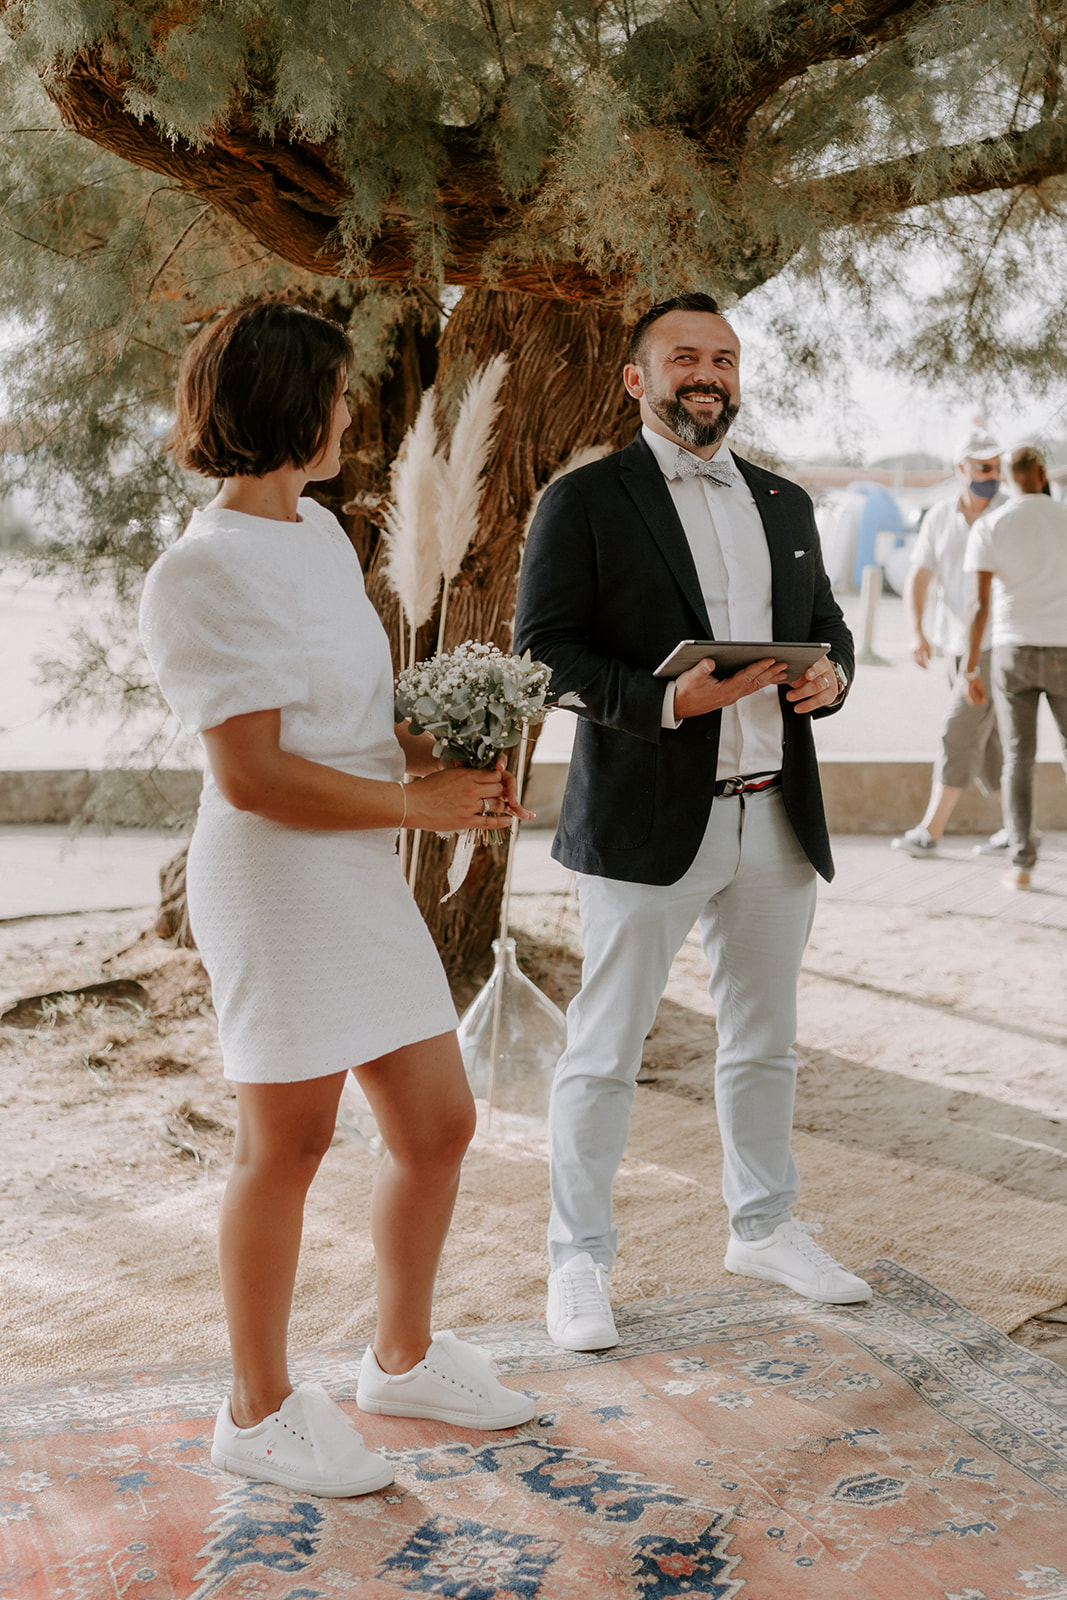 Mariage-CapFerret-ceremonie-couple-alchimie-boheme